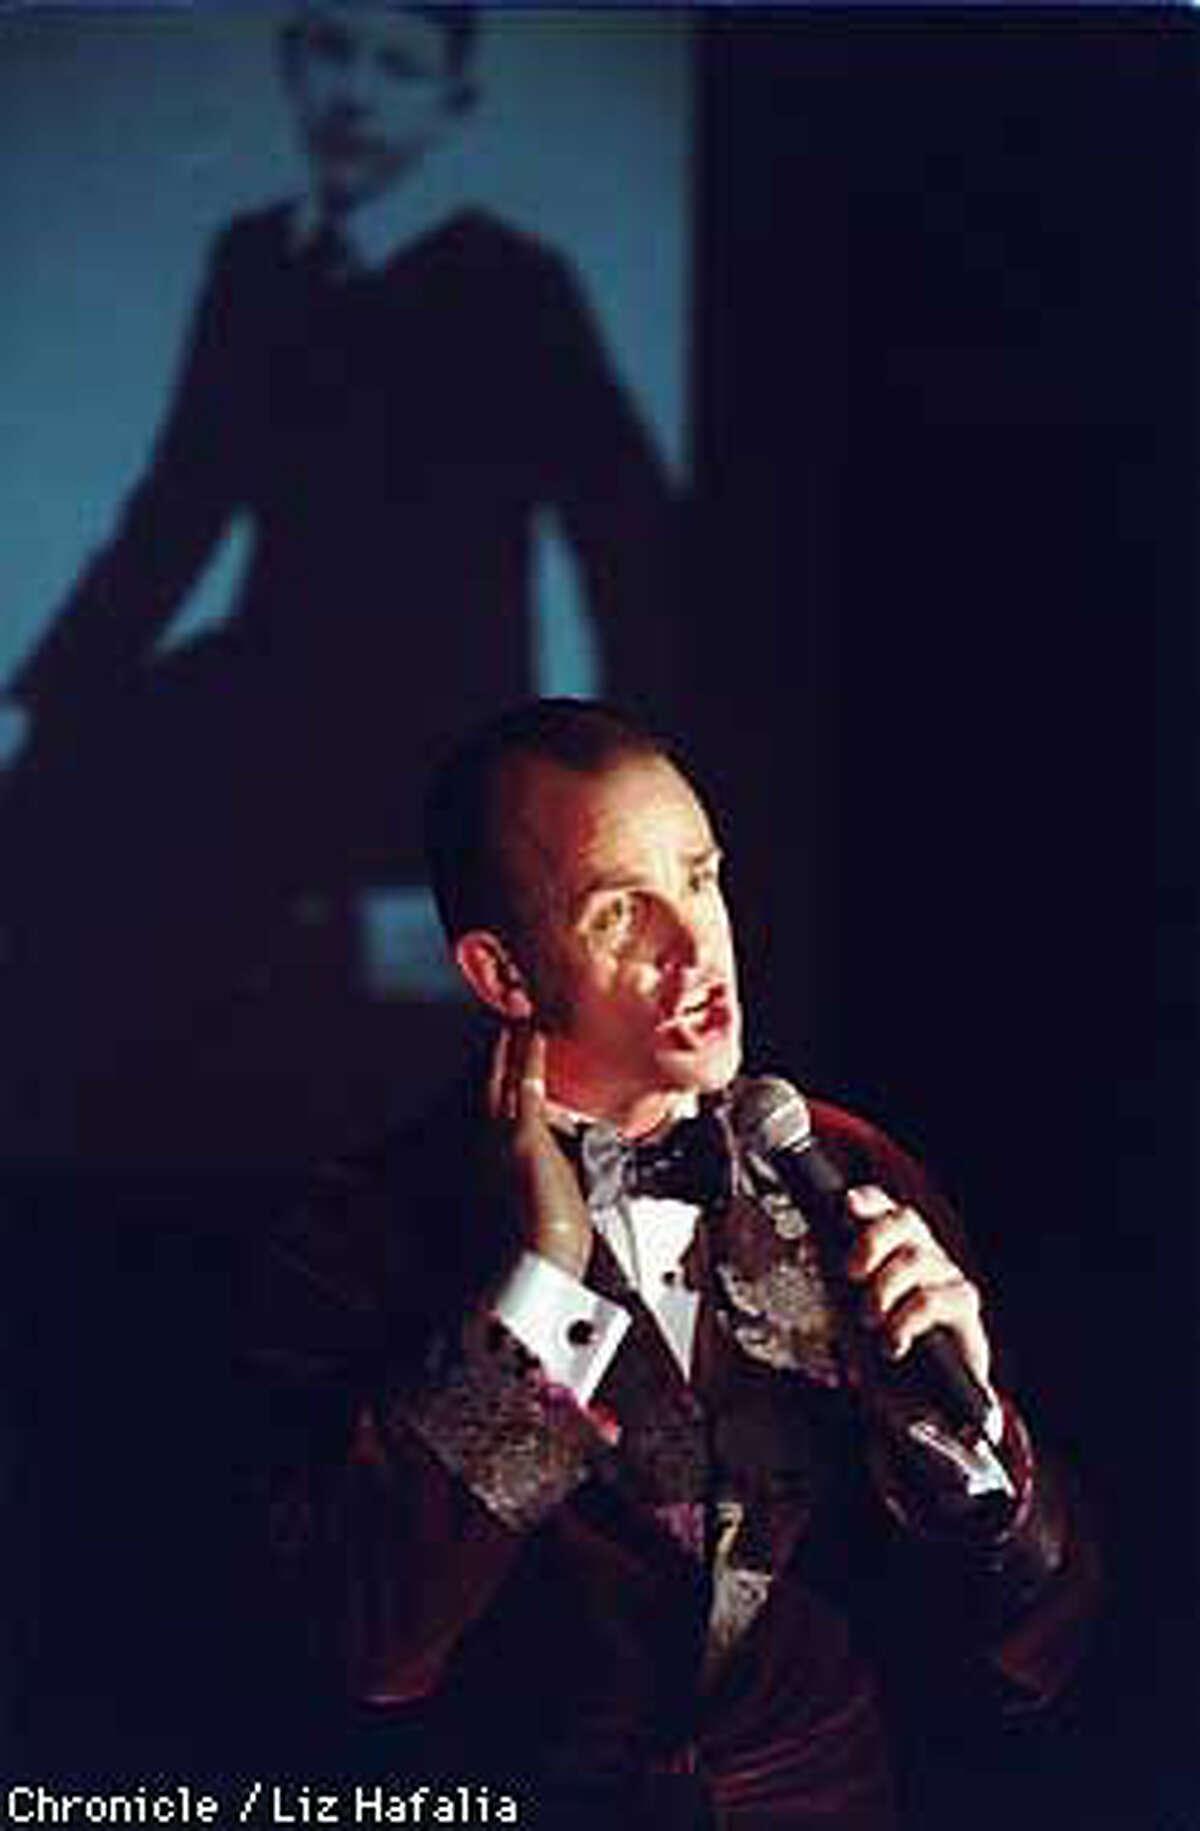 Craig Jessup pays tribute to Noel Coward's Vegas days with his one-man cabaret show, ``Craig Jessup Sings Noel Coward.'' Chronicle Photo by Liz Hafalia